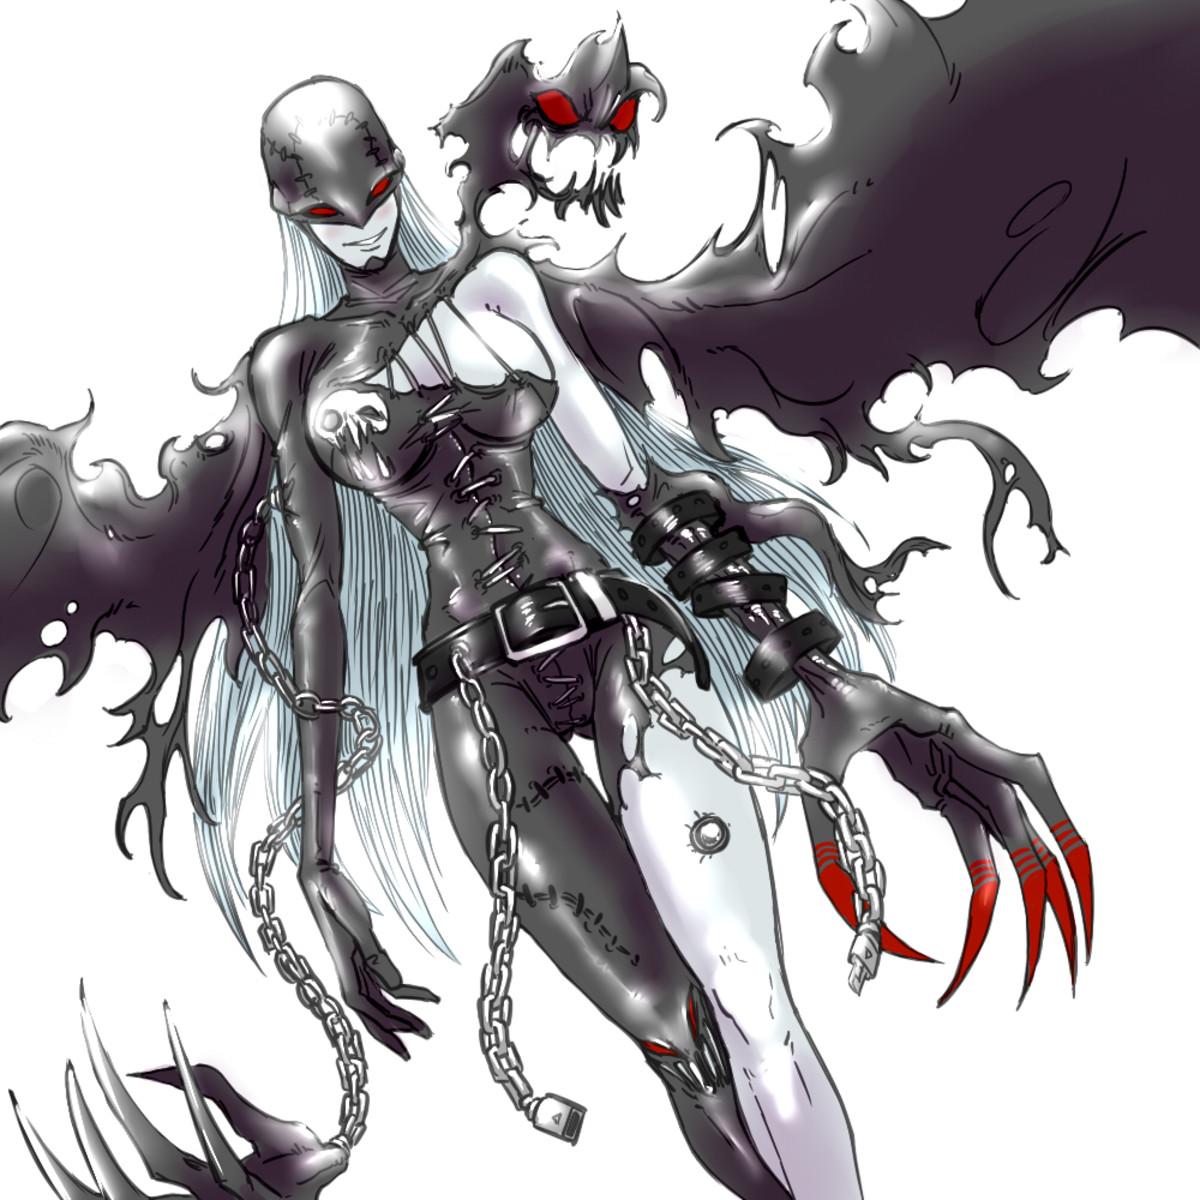 LadyDevimon